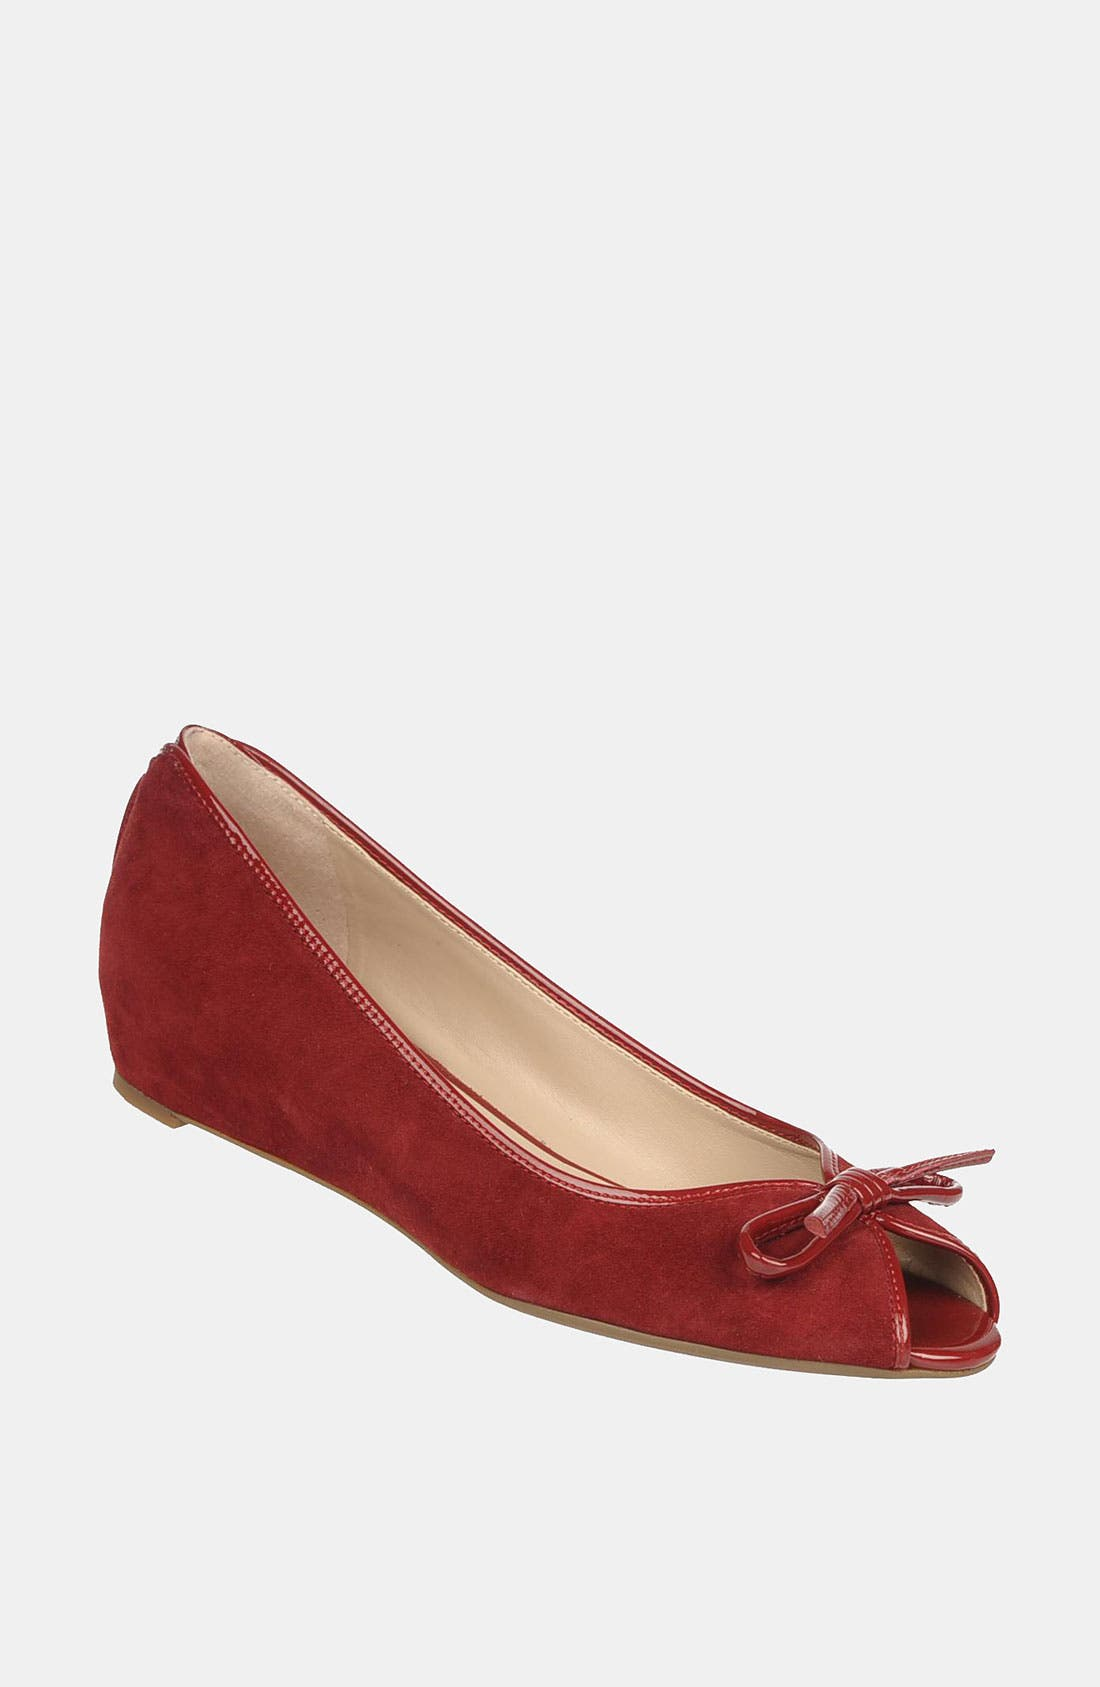 Main Image - Franco Sarto 'Model' Peep Toe Flat